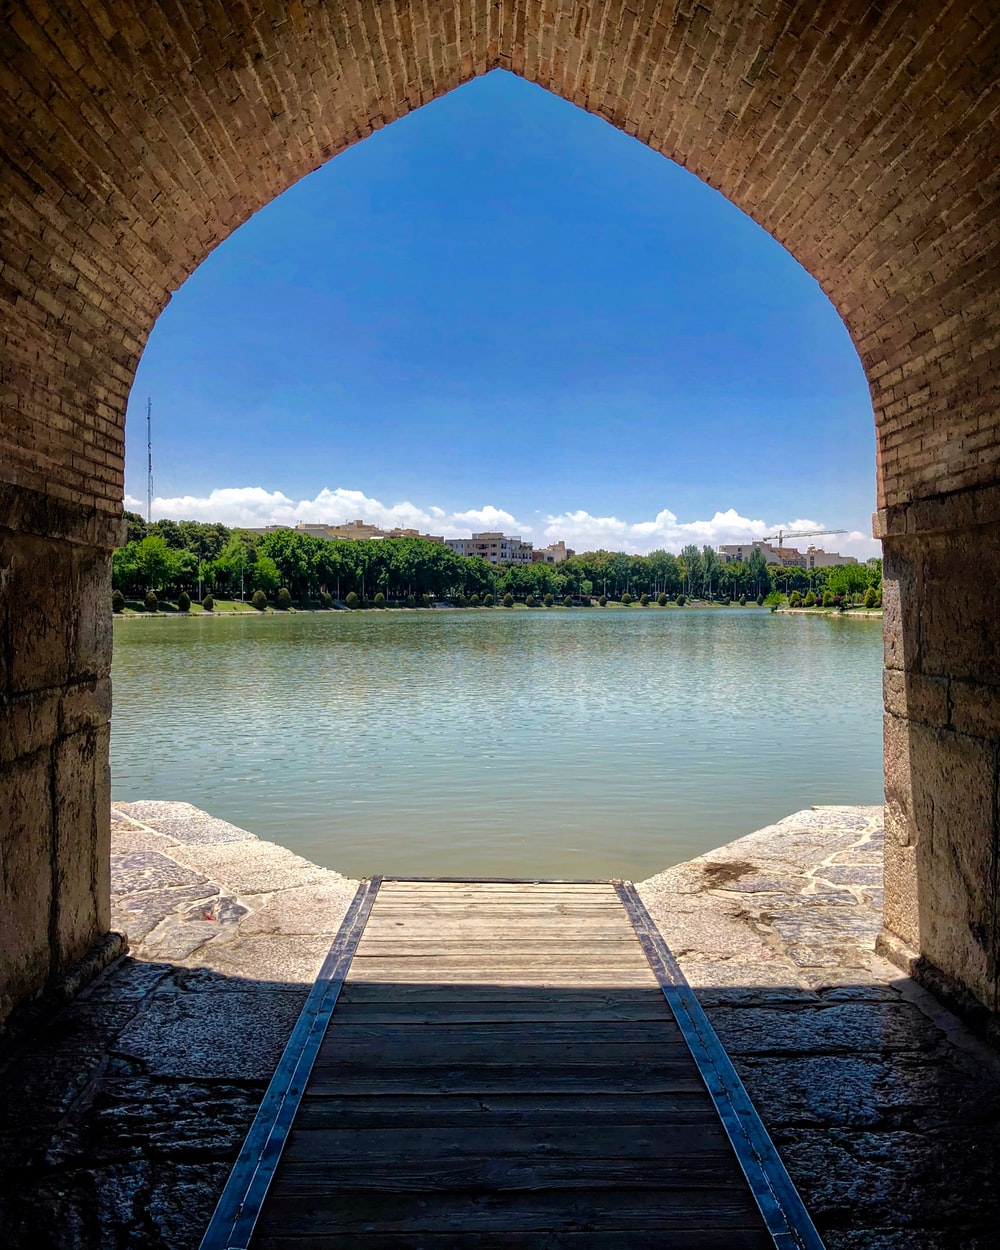 tunnel near body of water